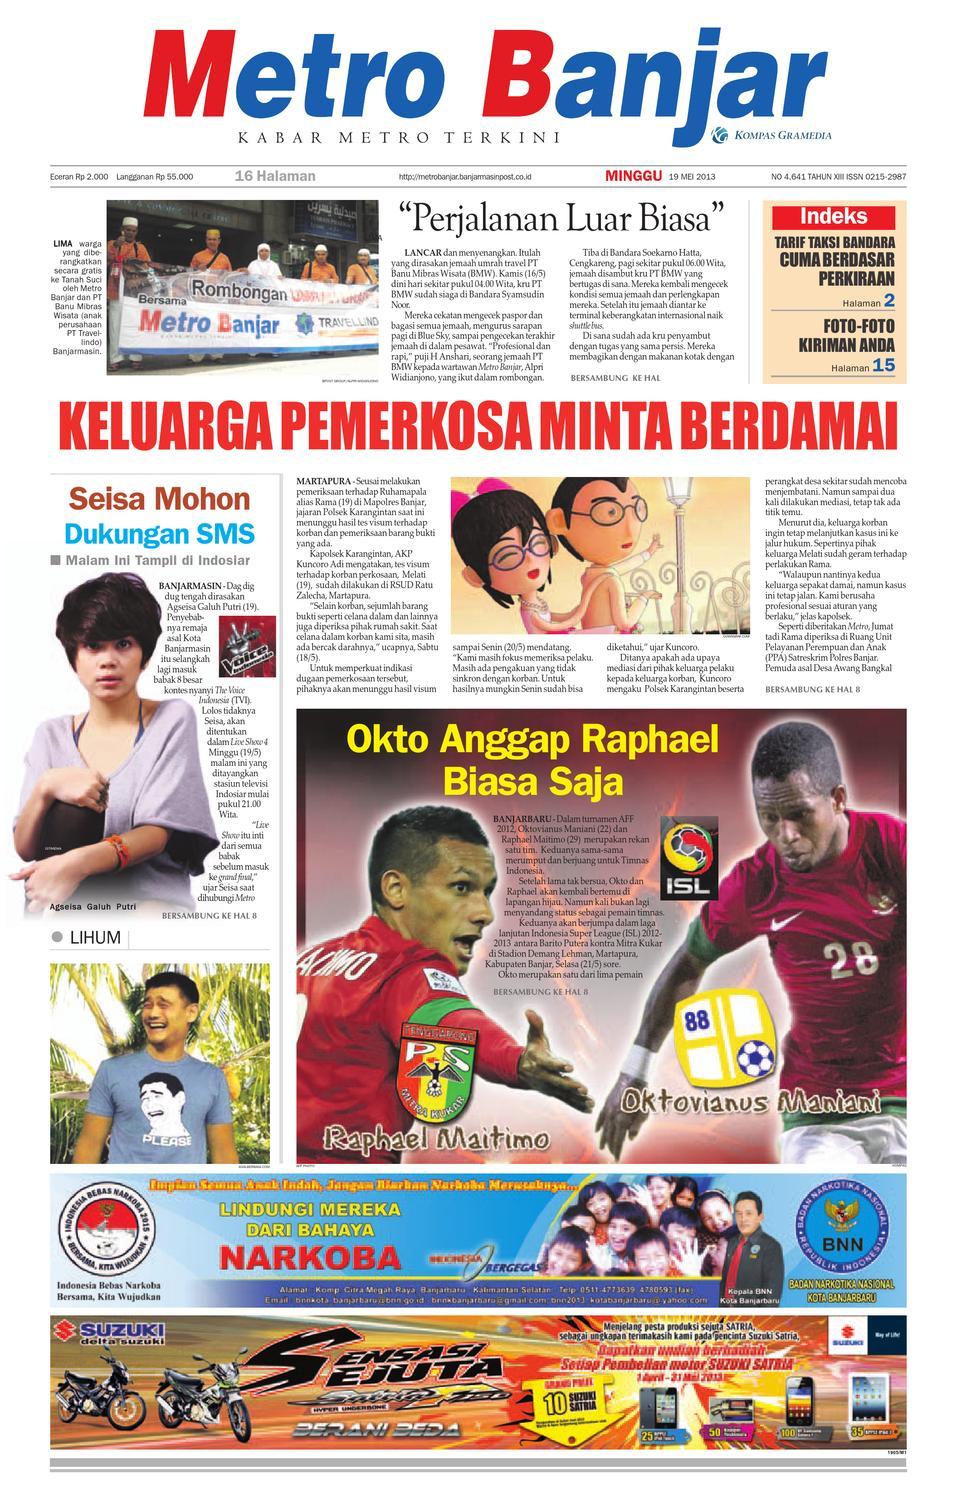 Metro Banjar edisi Minggu feab36928a